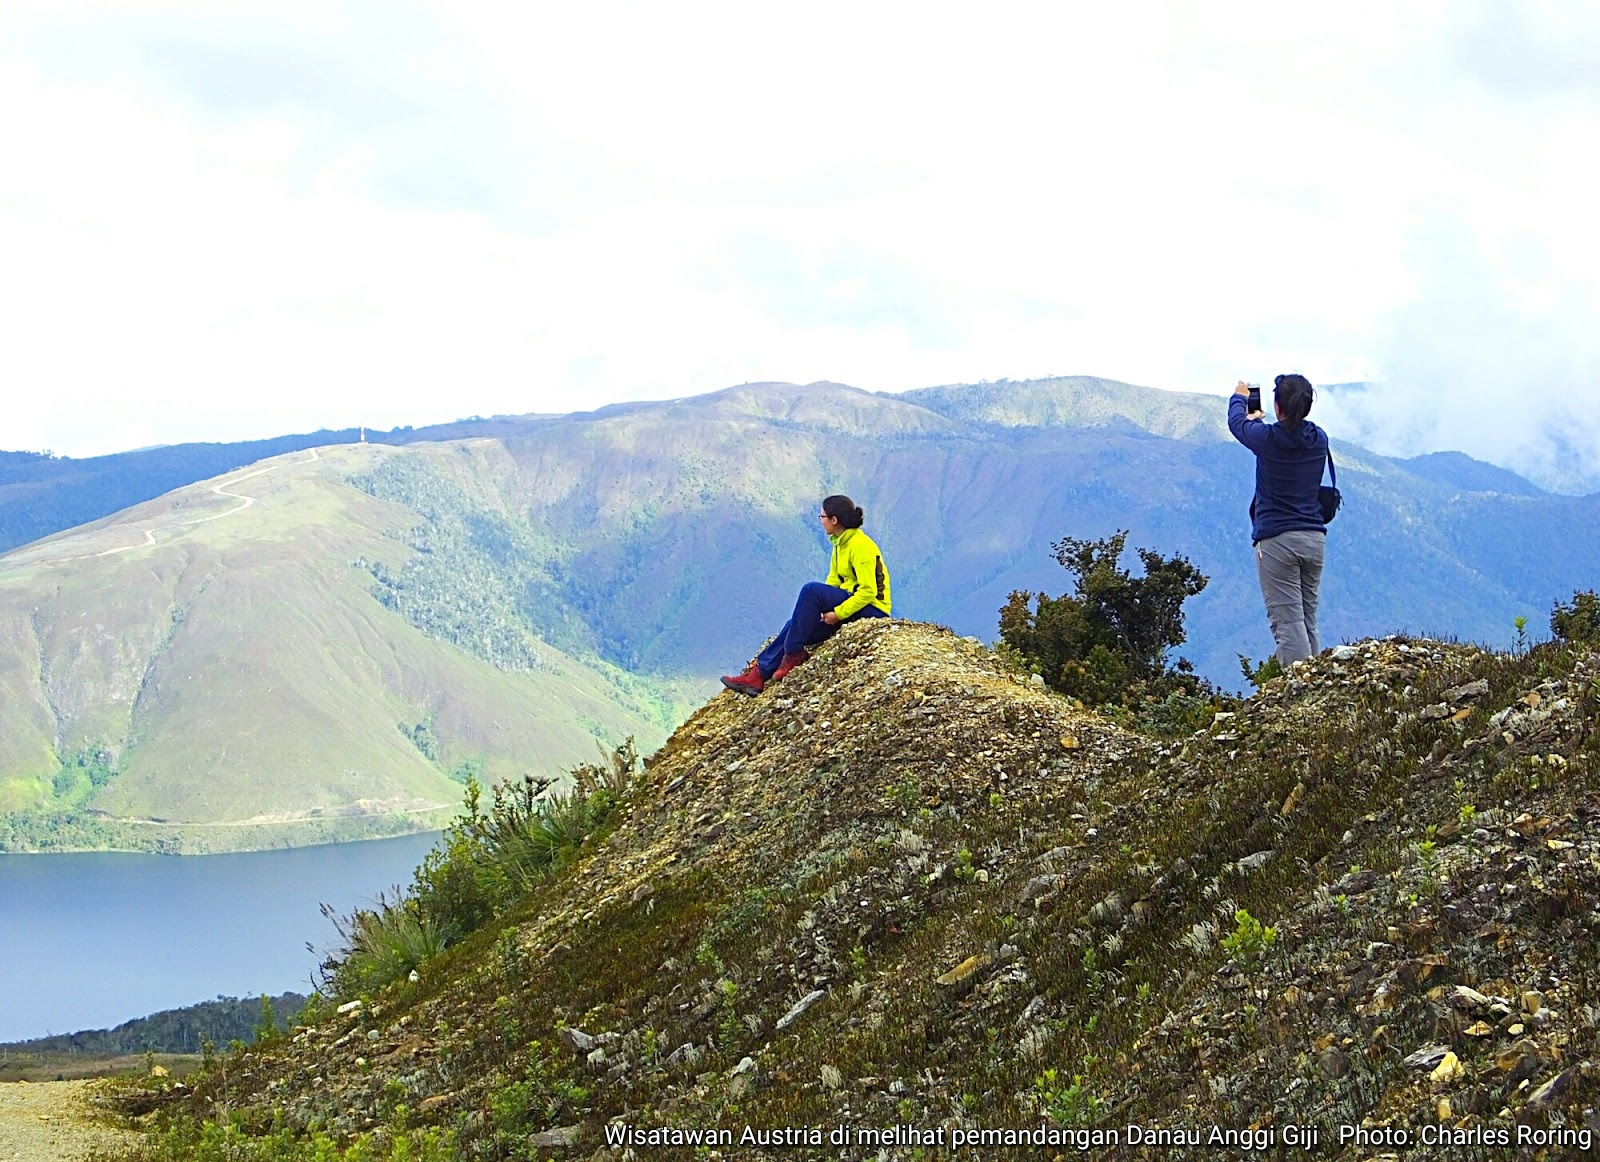 Dpd Hpi Papua Barat Berwisata Ke Danau Anggi